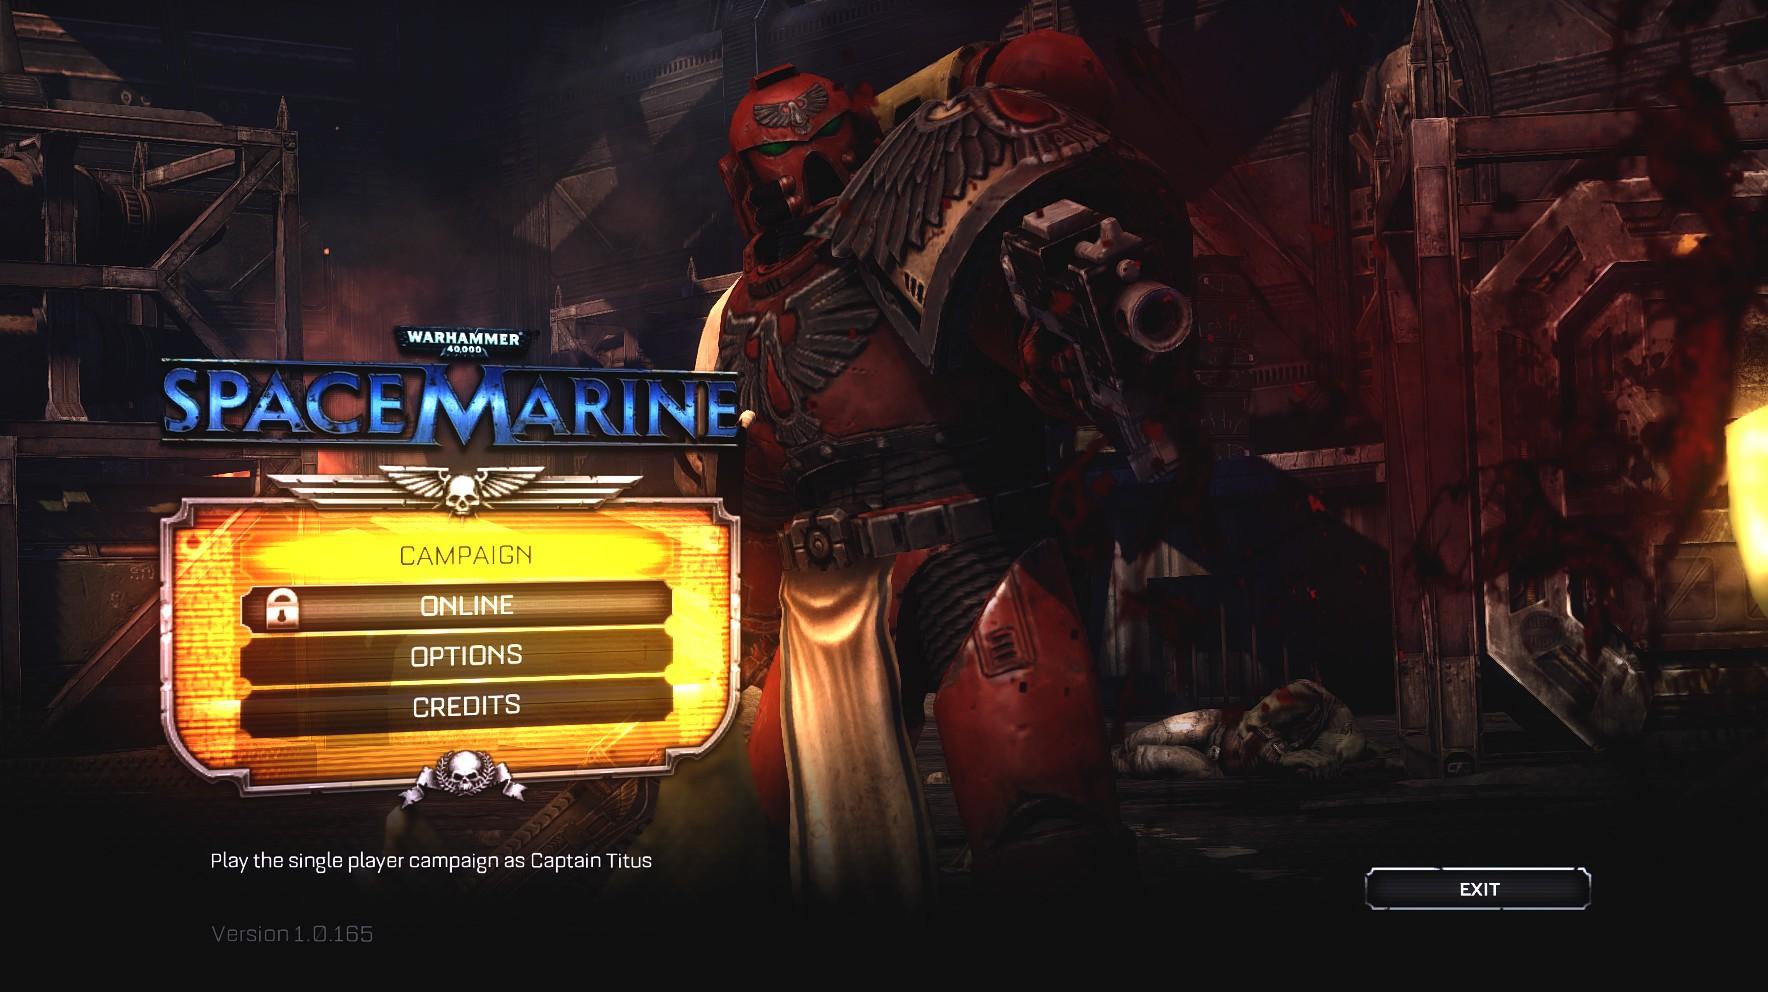 Blood raven mod addon - Warhammer 40,000: Space Marine - Mod DB